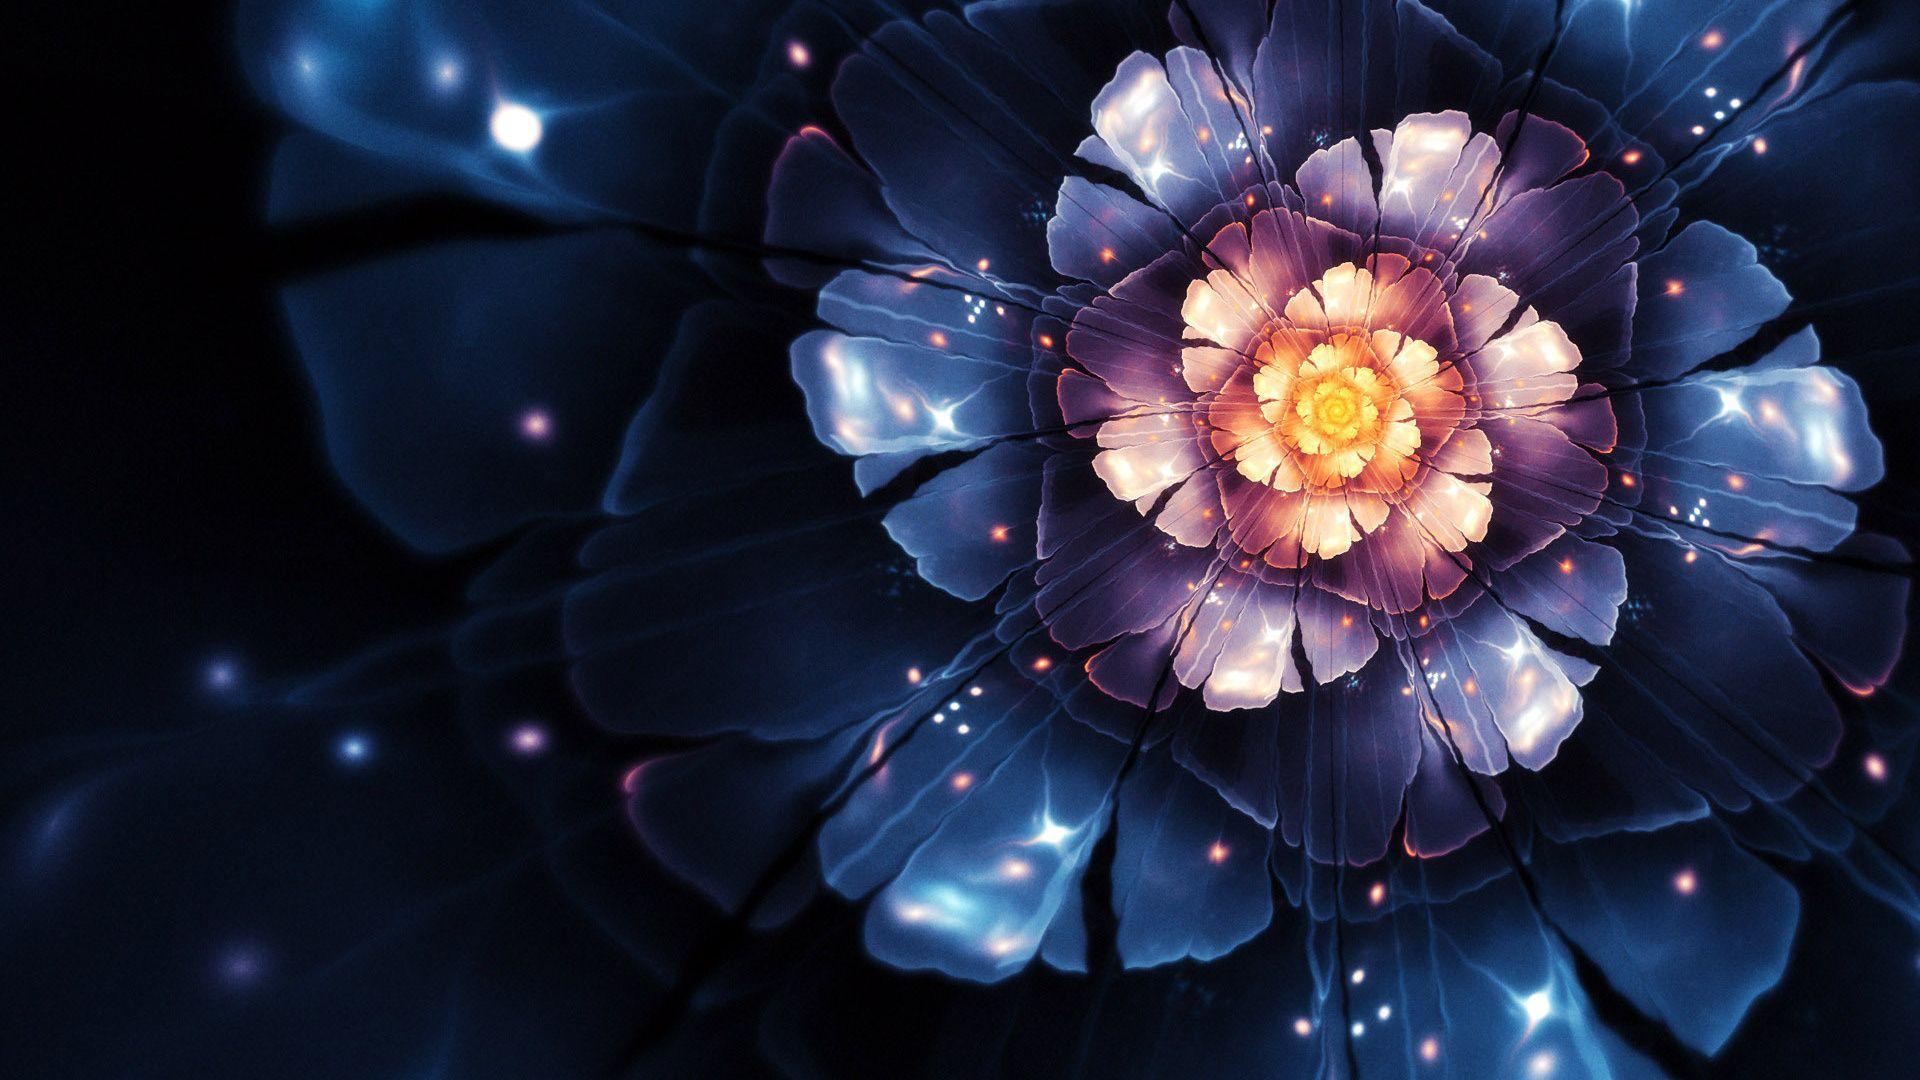 Fractal Flowers, Fabulous Flowers